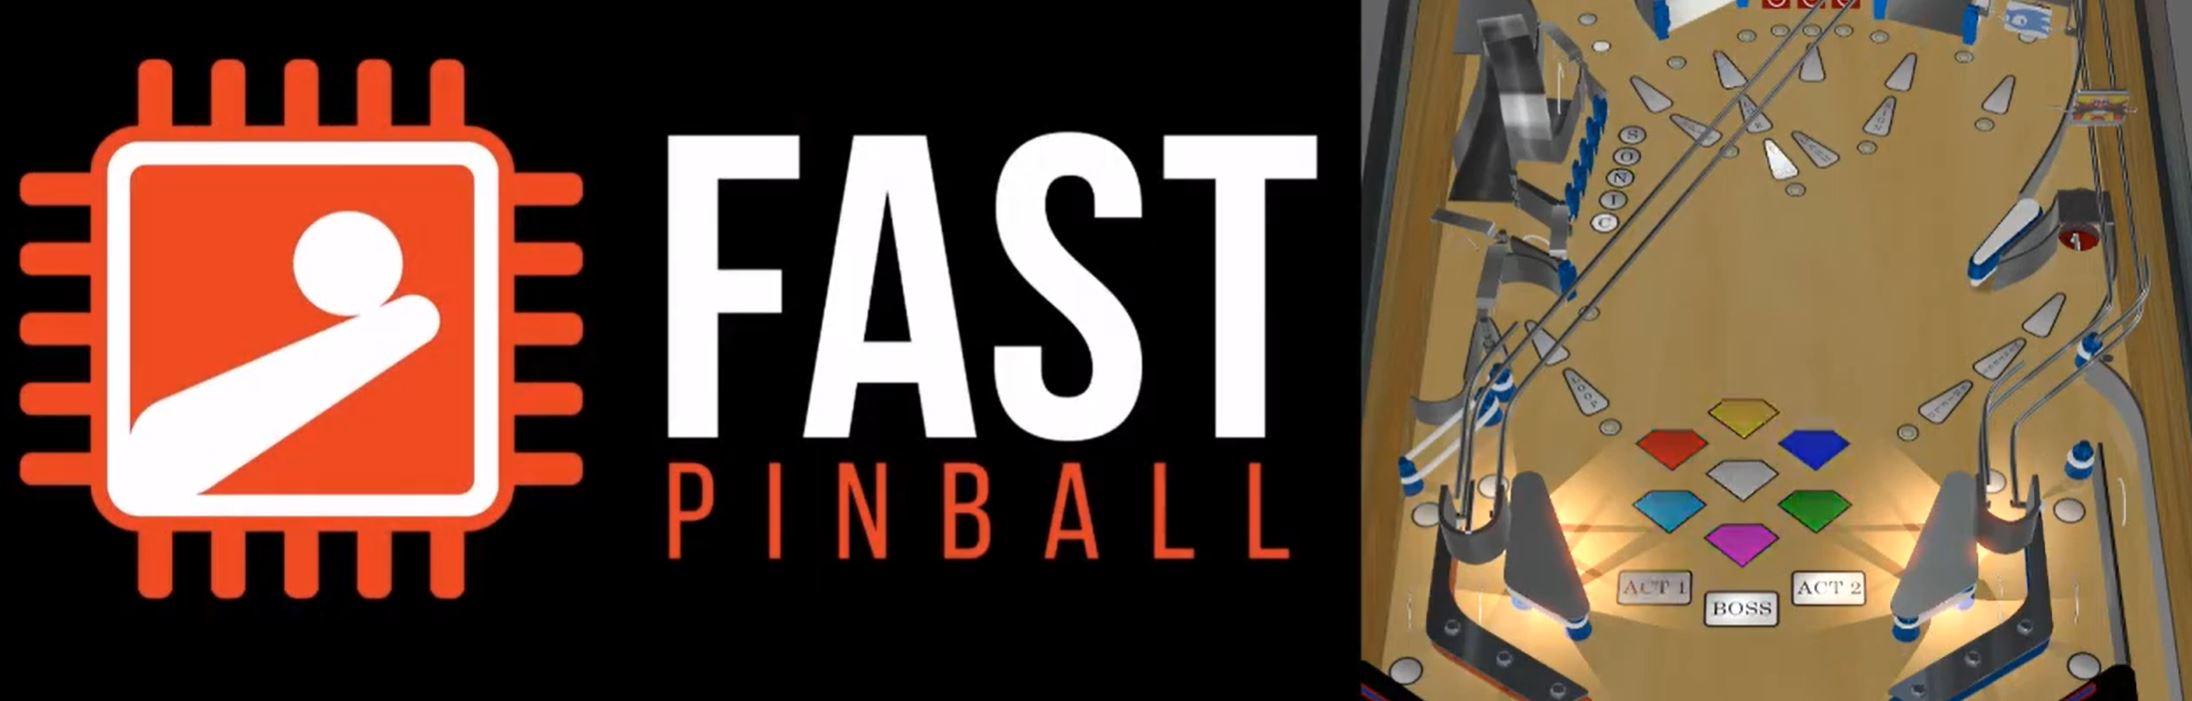 Gotta go FAST Pinball! (Sonic Spinball)